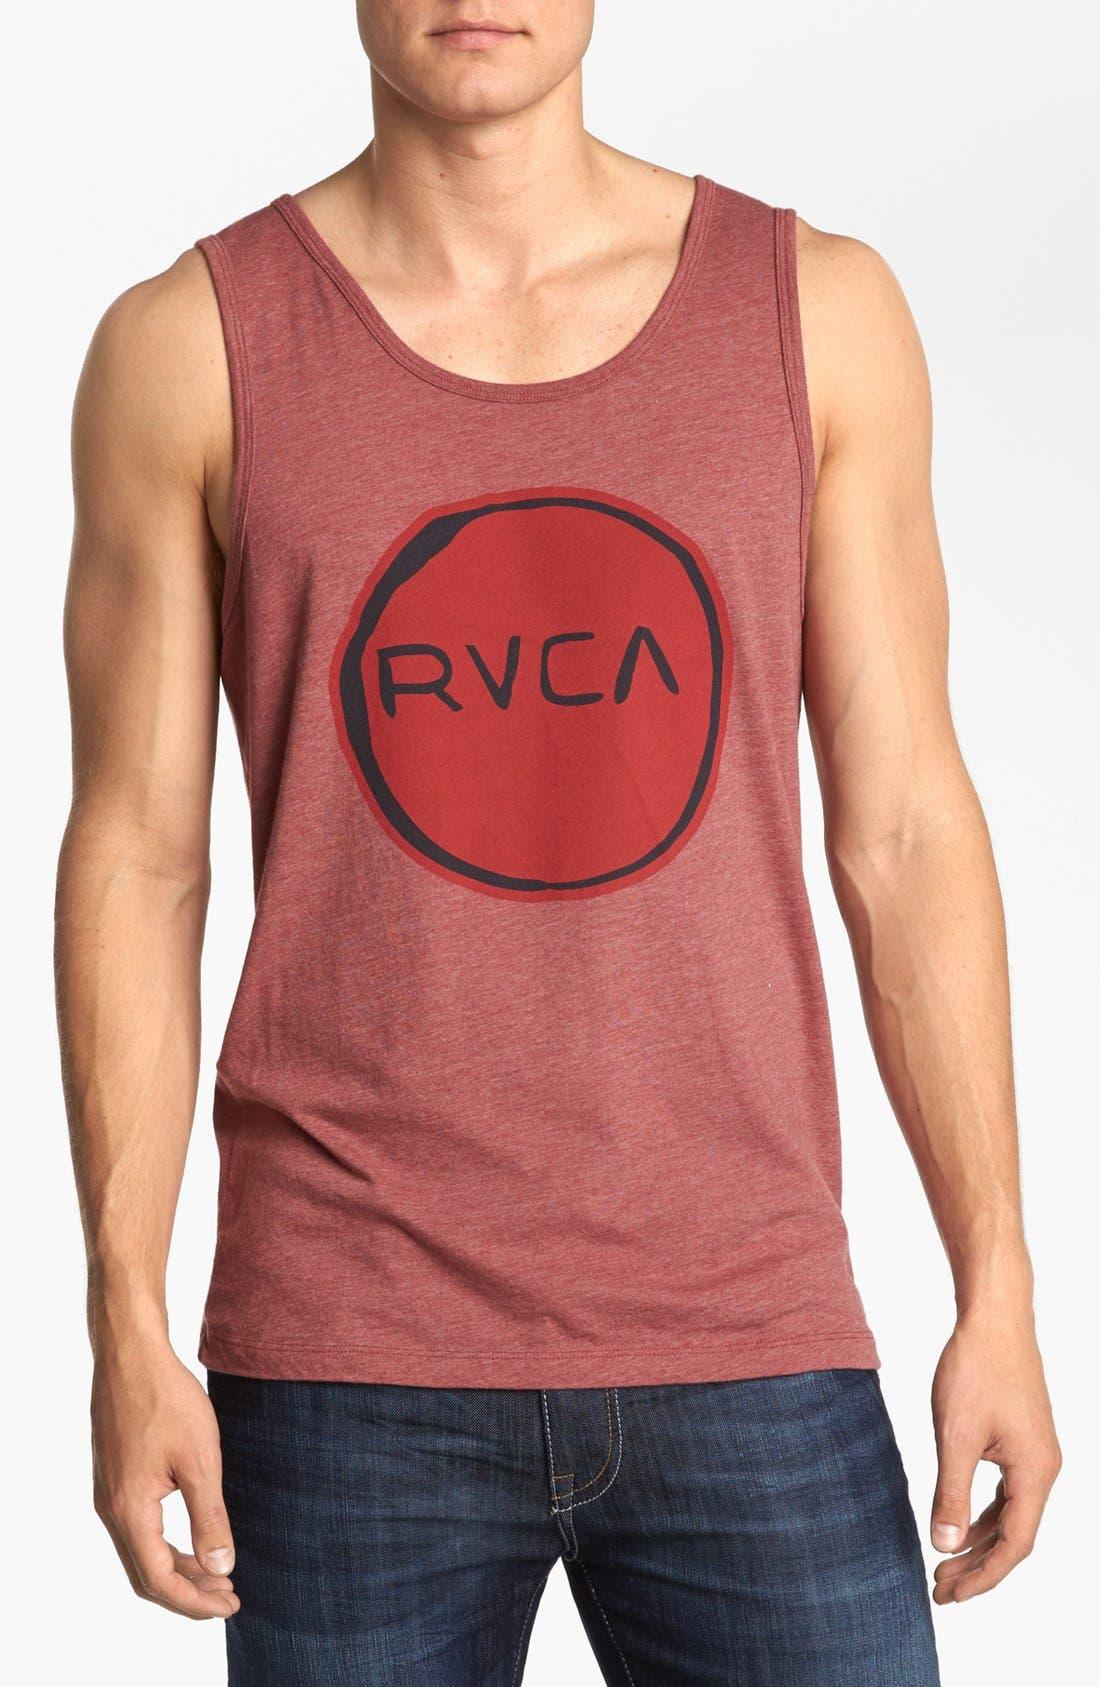 Alternate Image 1 Selected - RVCA 'Melt Circle' Tank Top